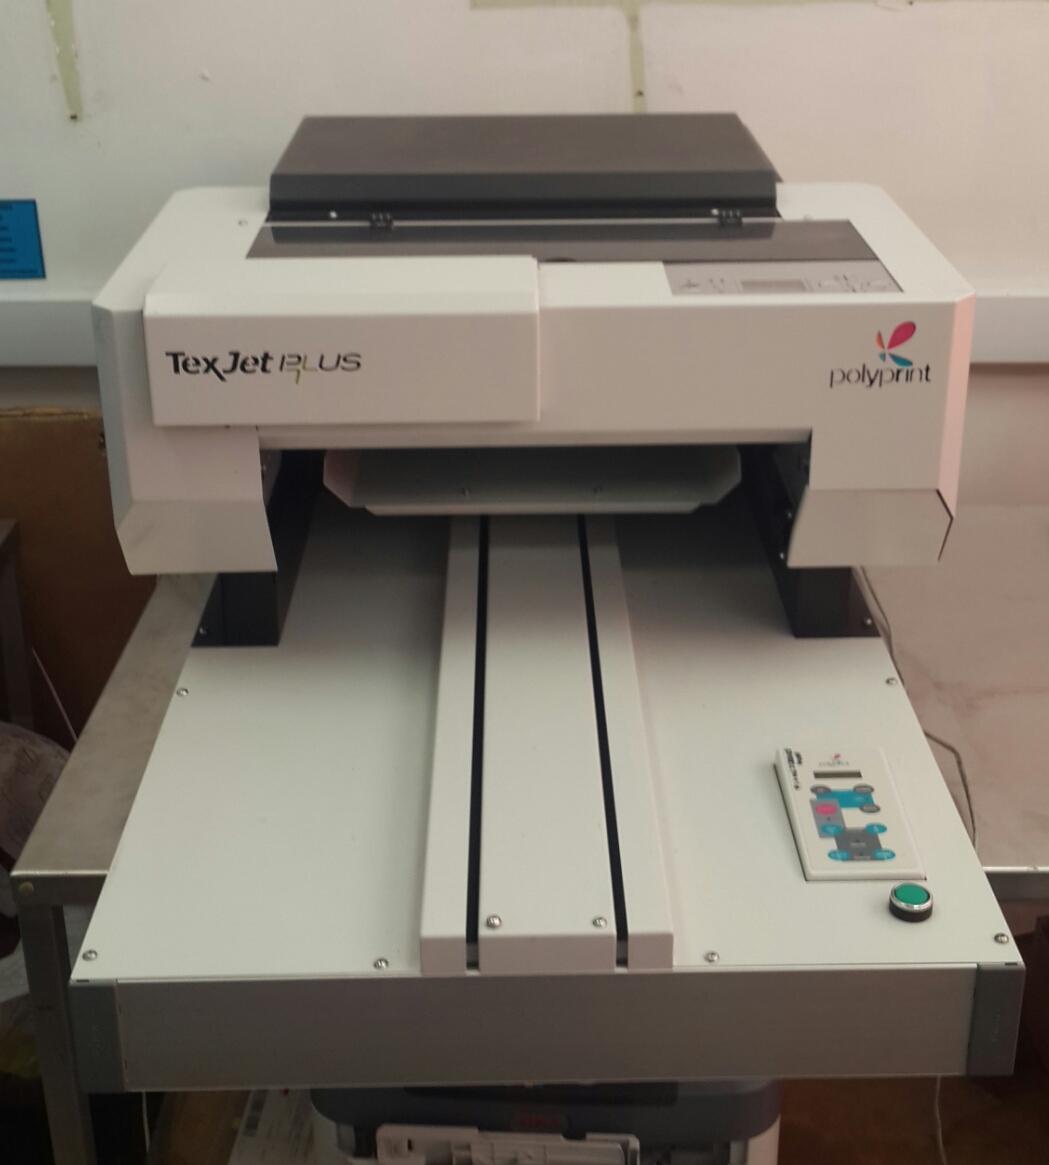 Polyprint Texjet Plus Direct To Garment Printer